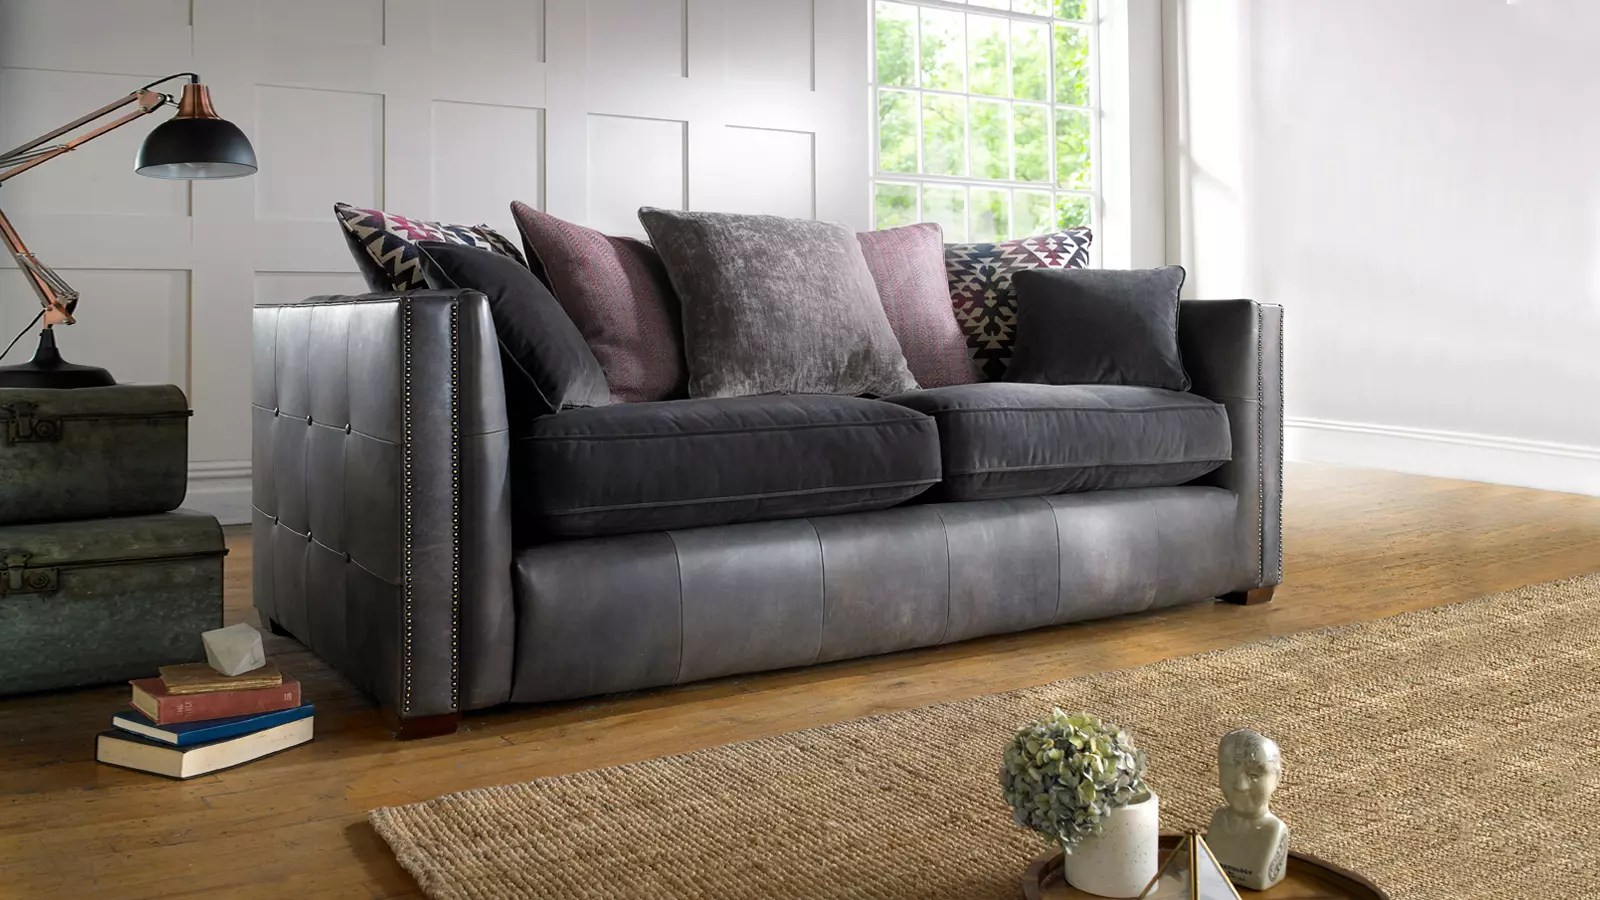 retro sofas fulham ikea usa sofa sofology corner beds and chairs always